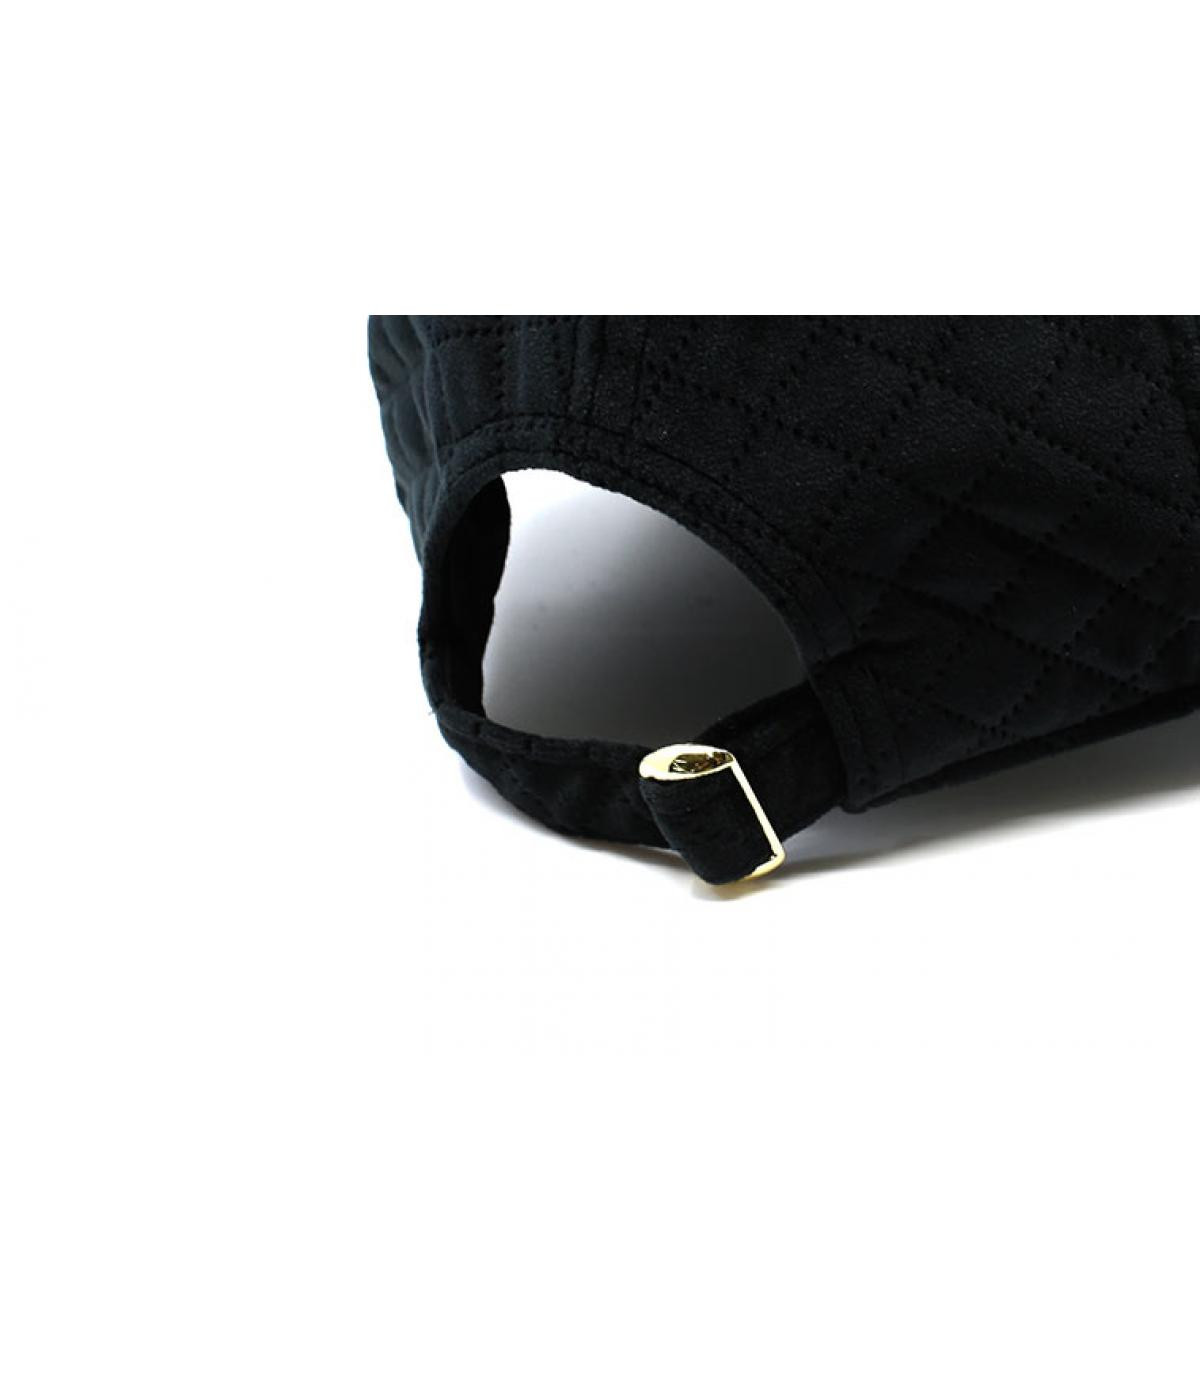 Details Wmns Winter Pack NY 9Forty olive black - afbeeling 5